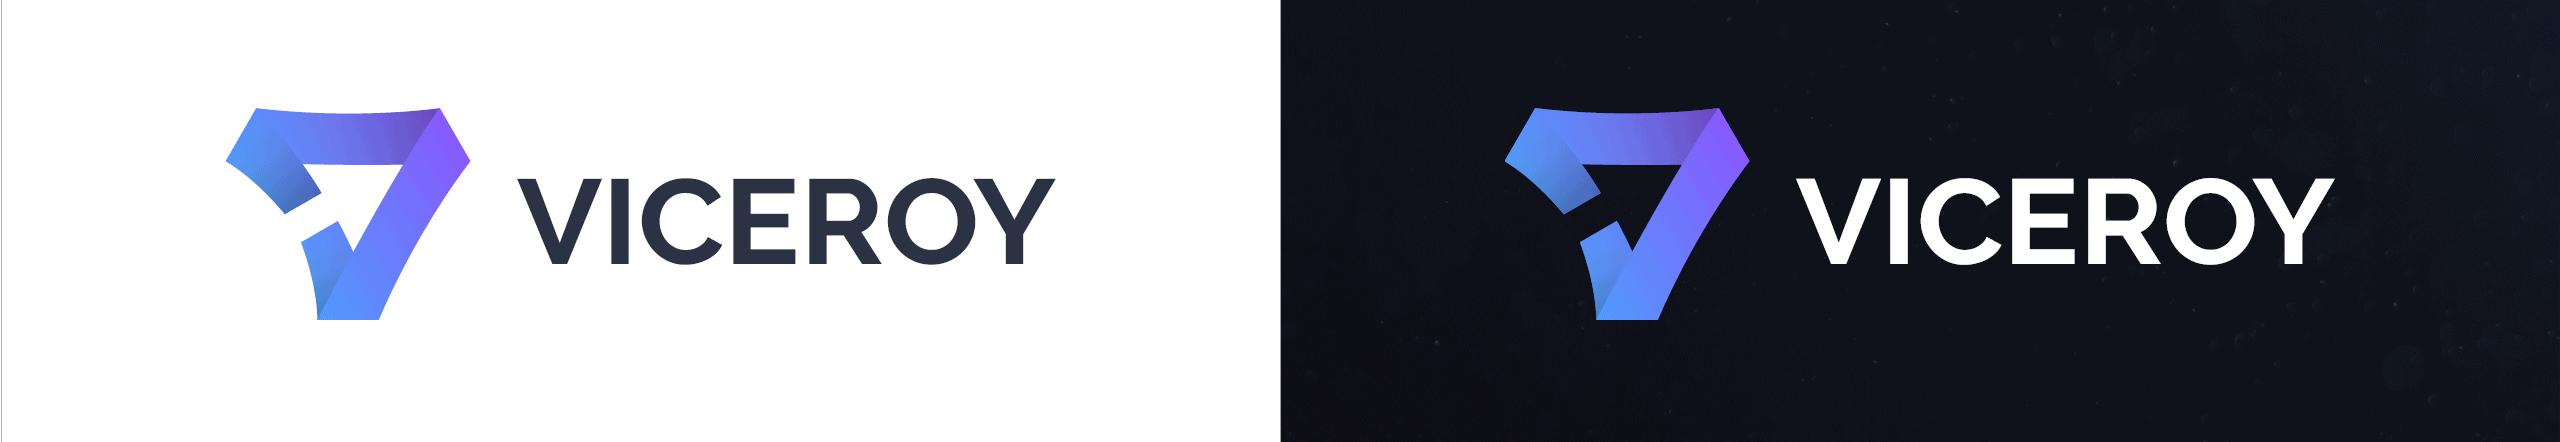 Viceroy - logo compare